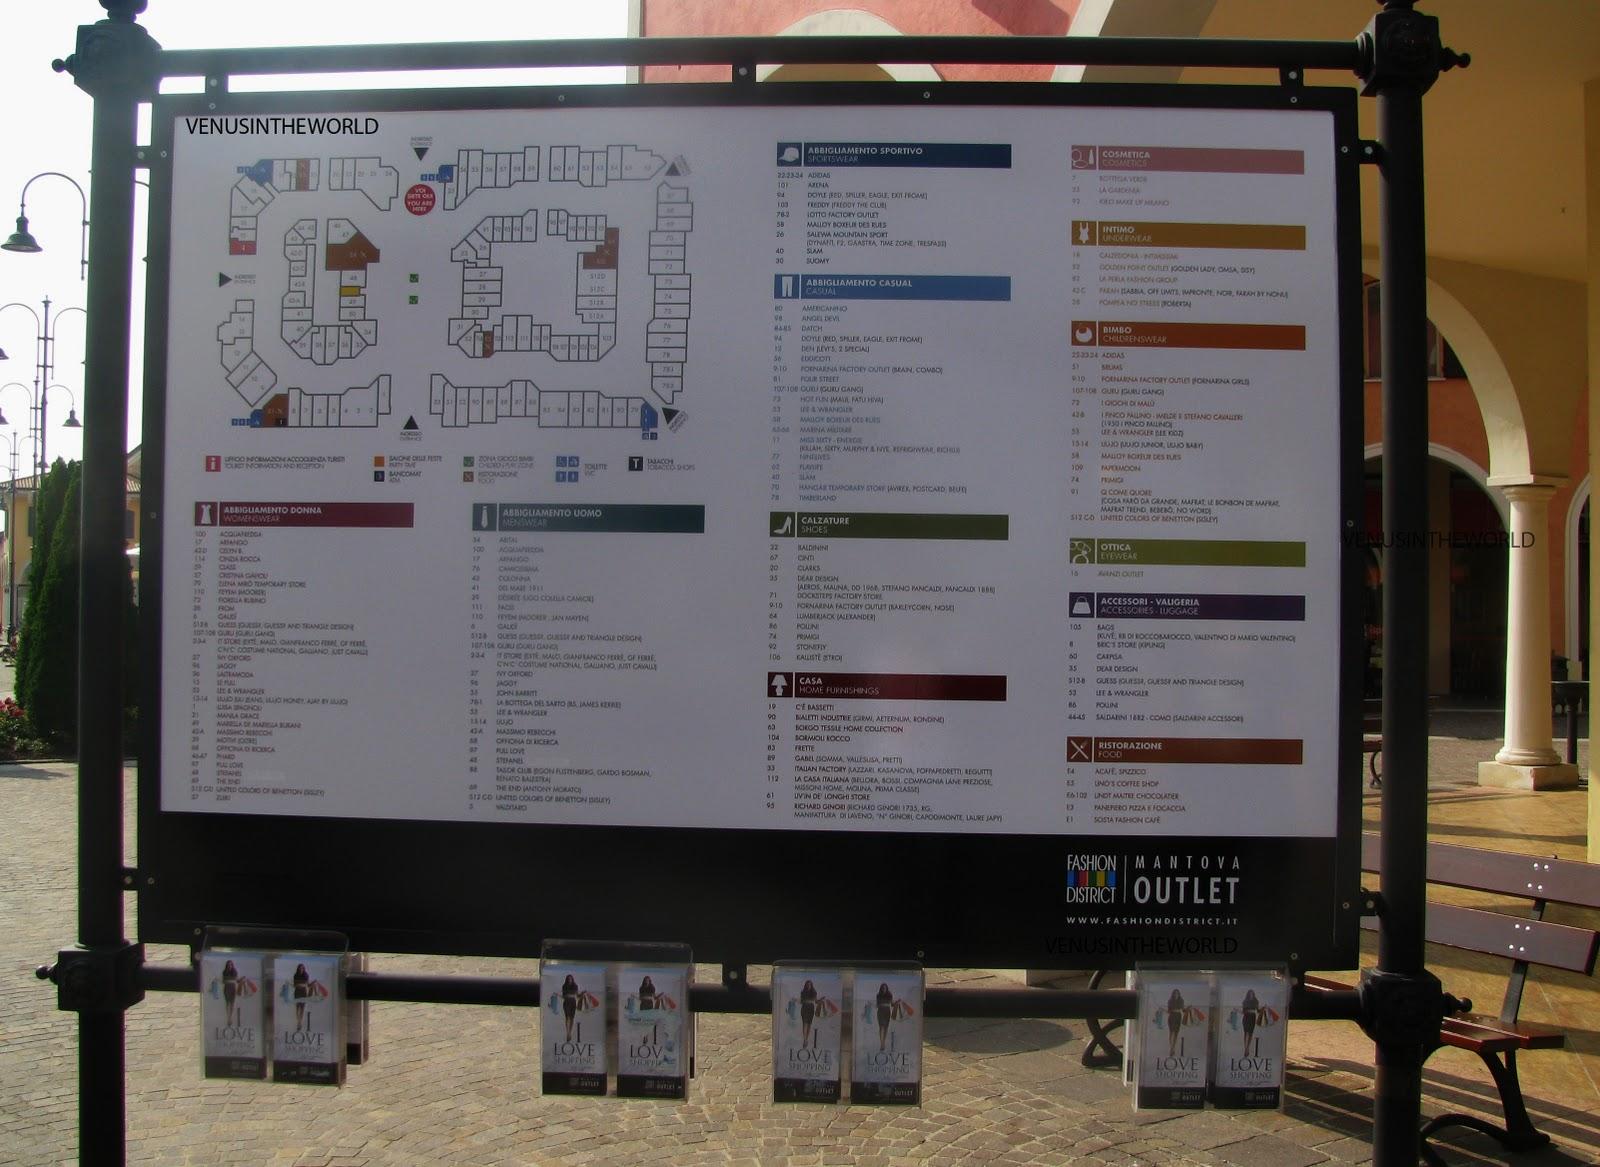 venusintheworld: Mantova Outlet